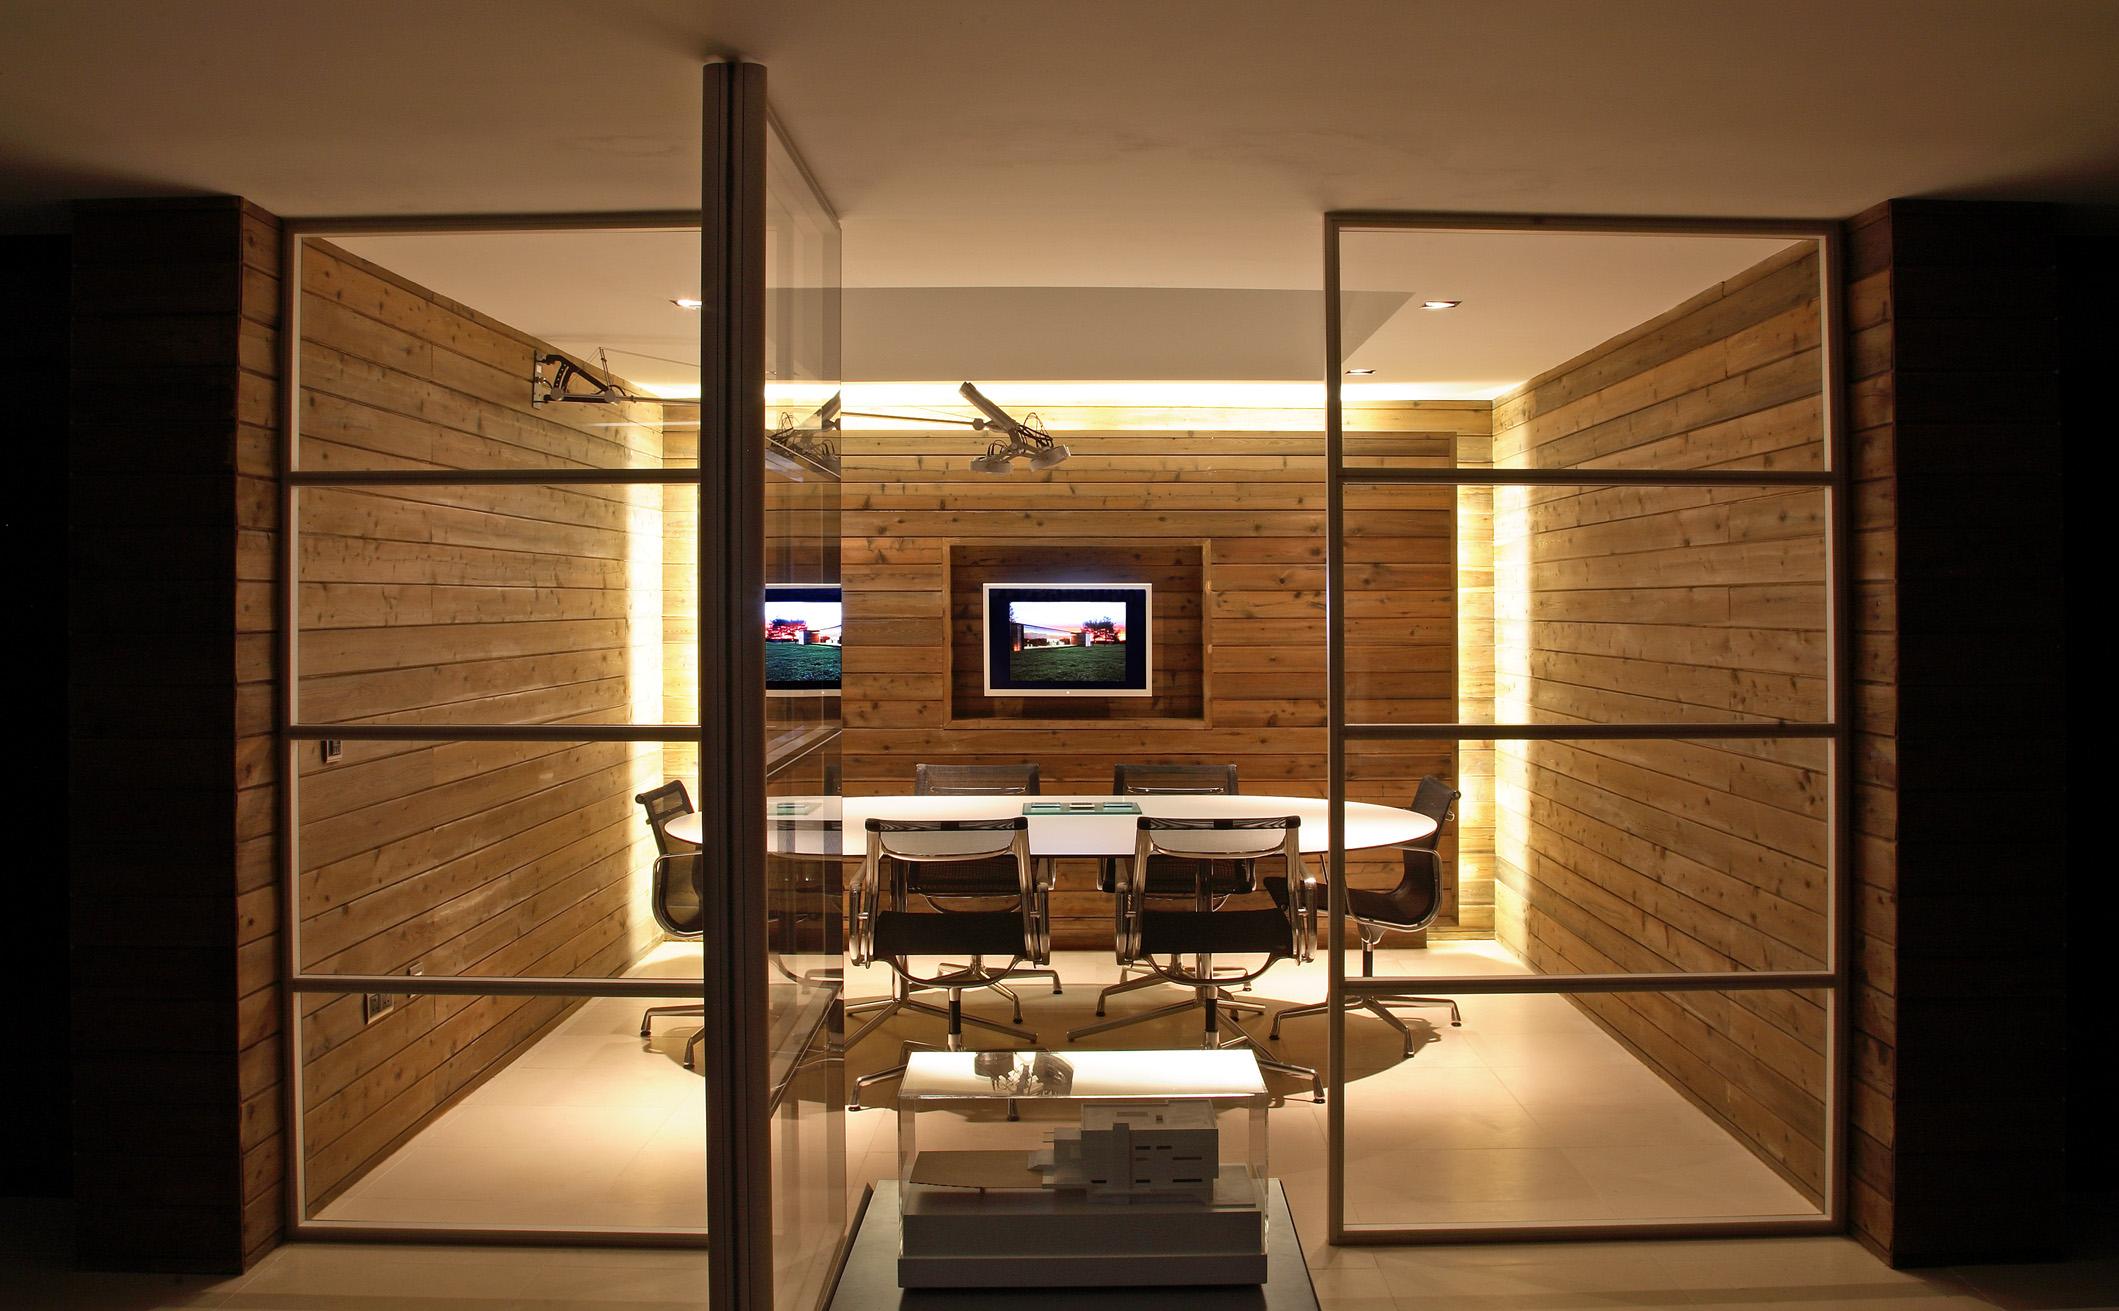 Commercial Studio Office Space Bedfordshire Nicolas Tye